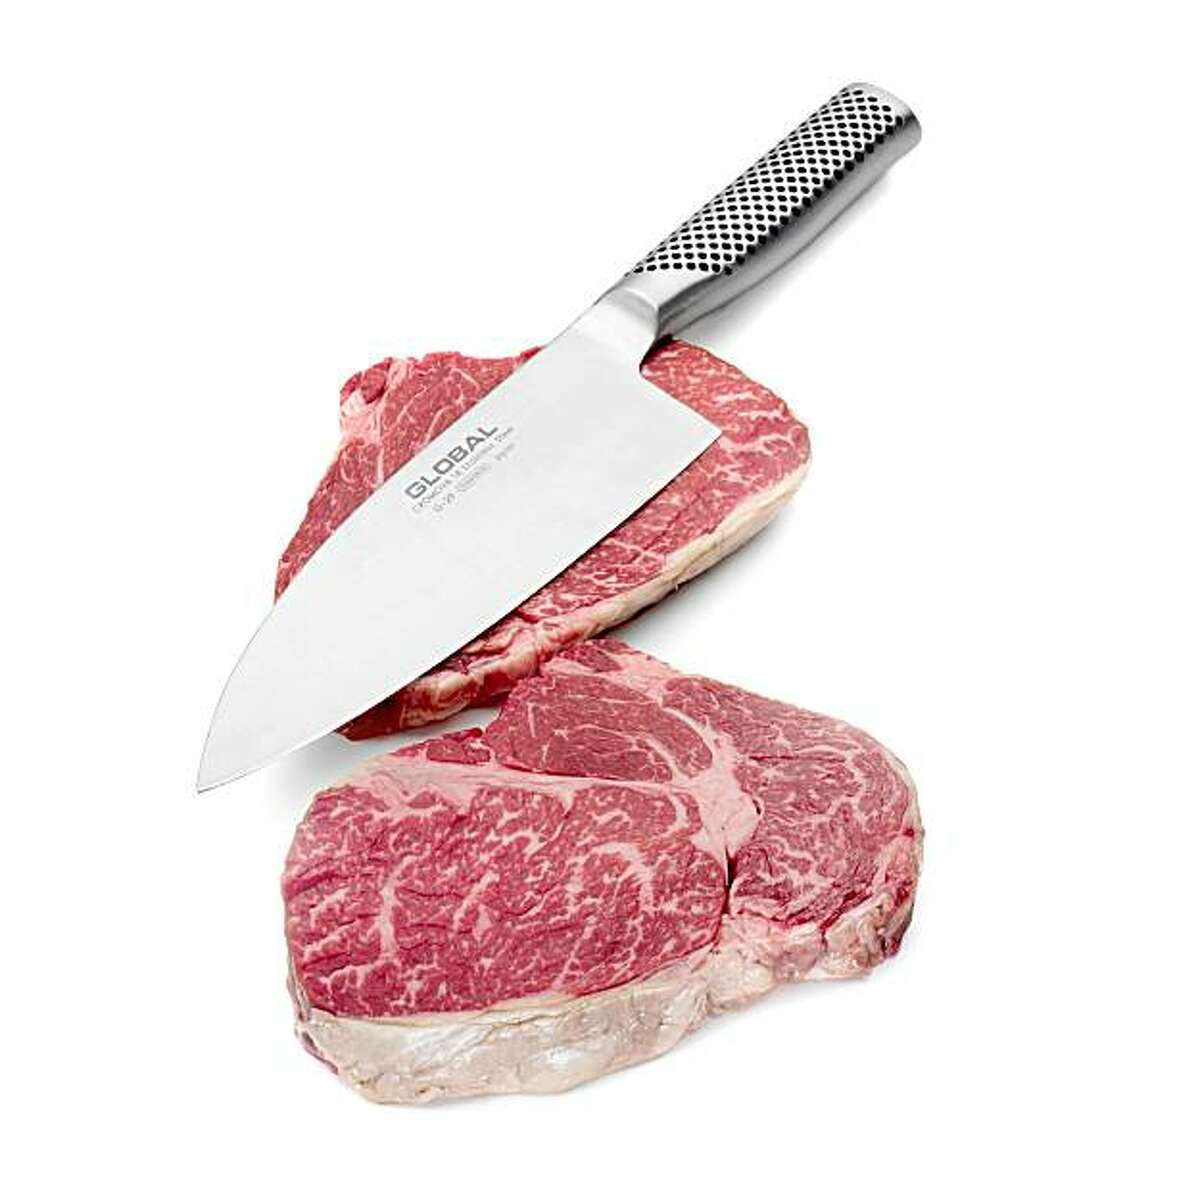 Ribeye steak- New Zealand grassfed free-range Wagyu-Angus cross from Firstlight Foods.